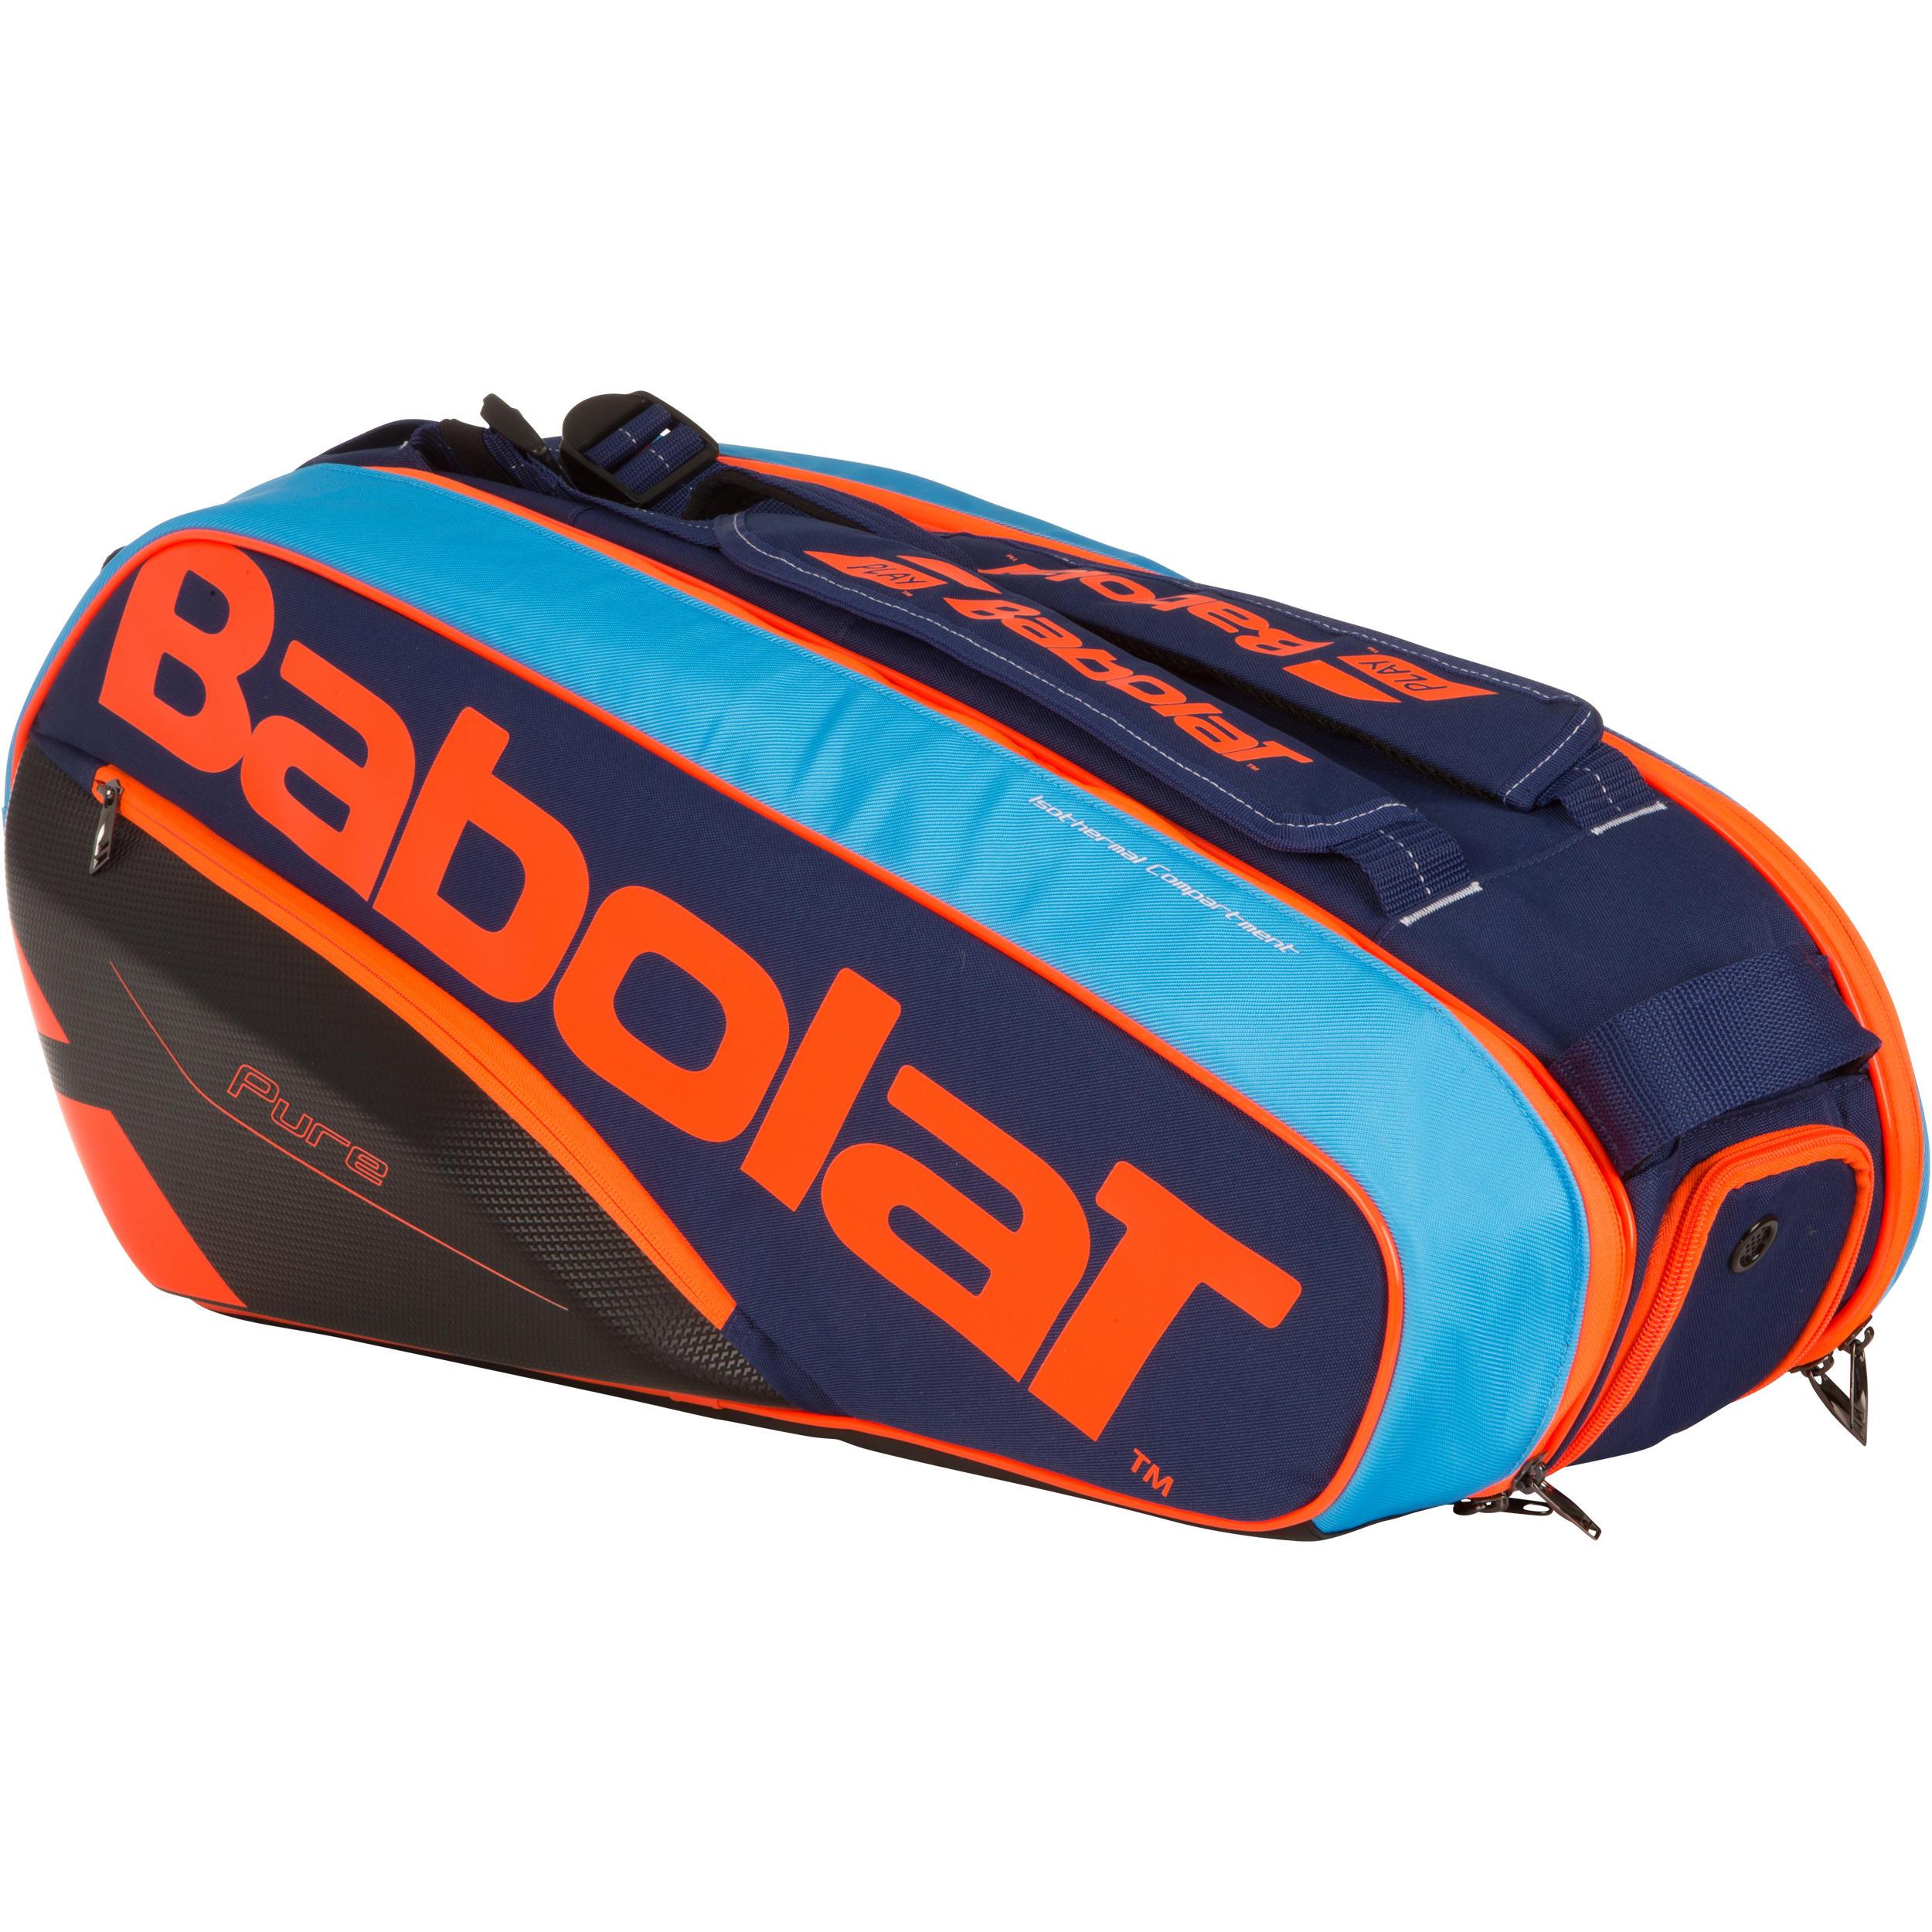 Babolat Tennistas RH Pure RG 6 rackets